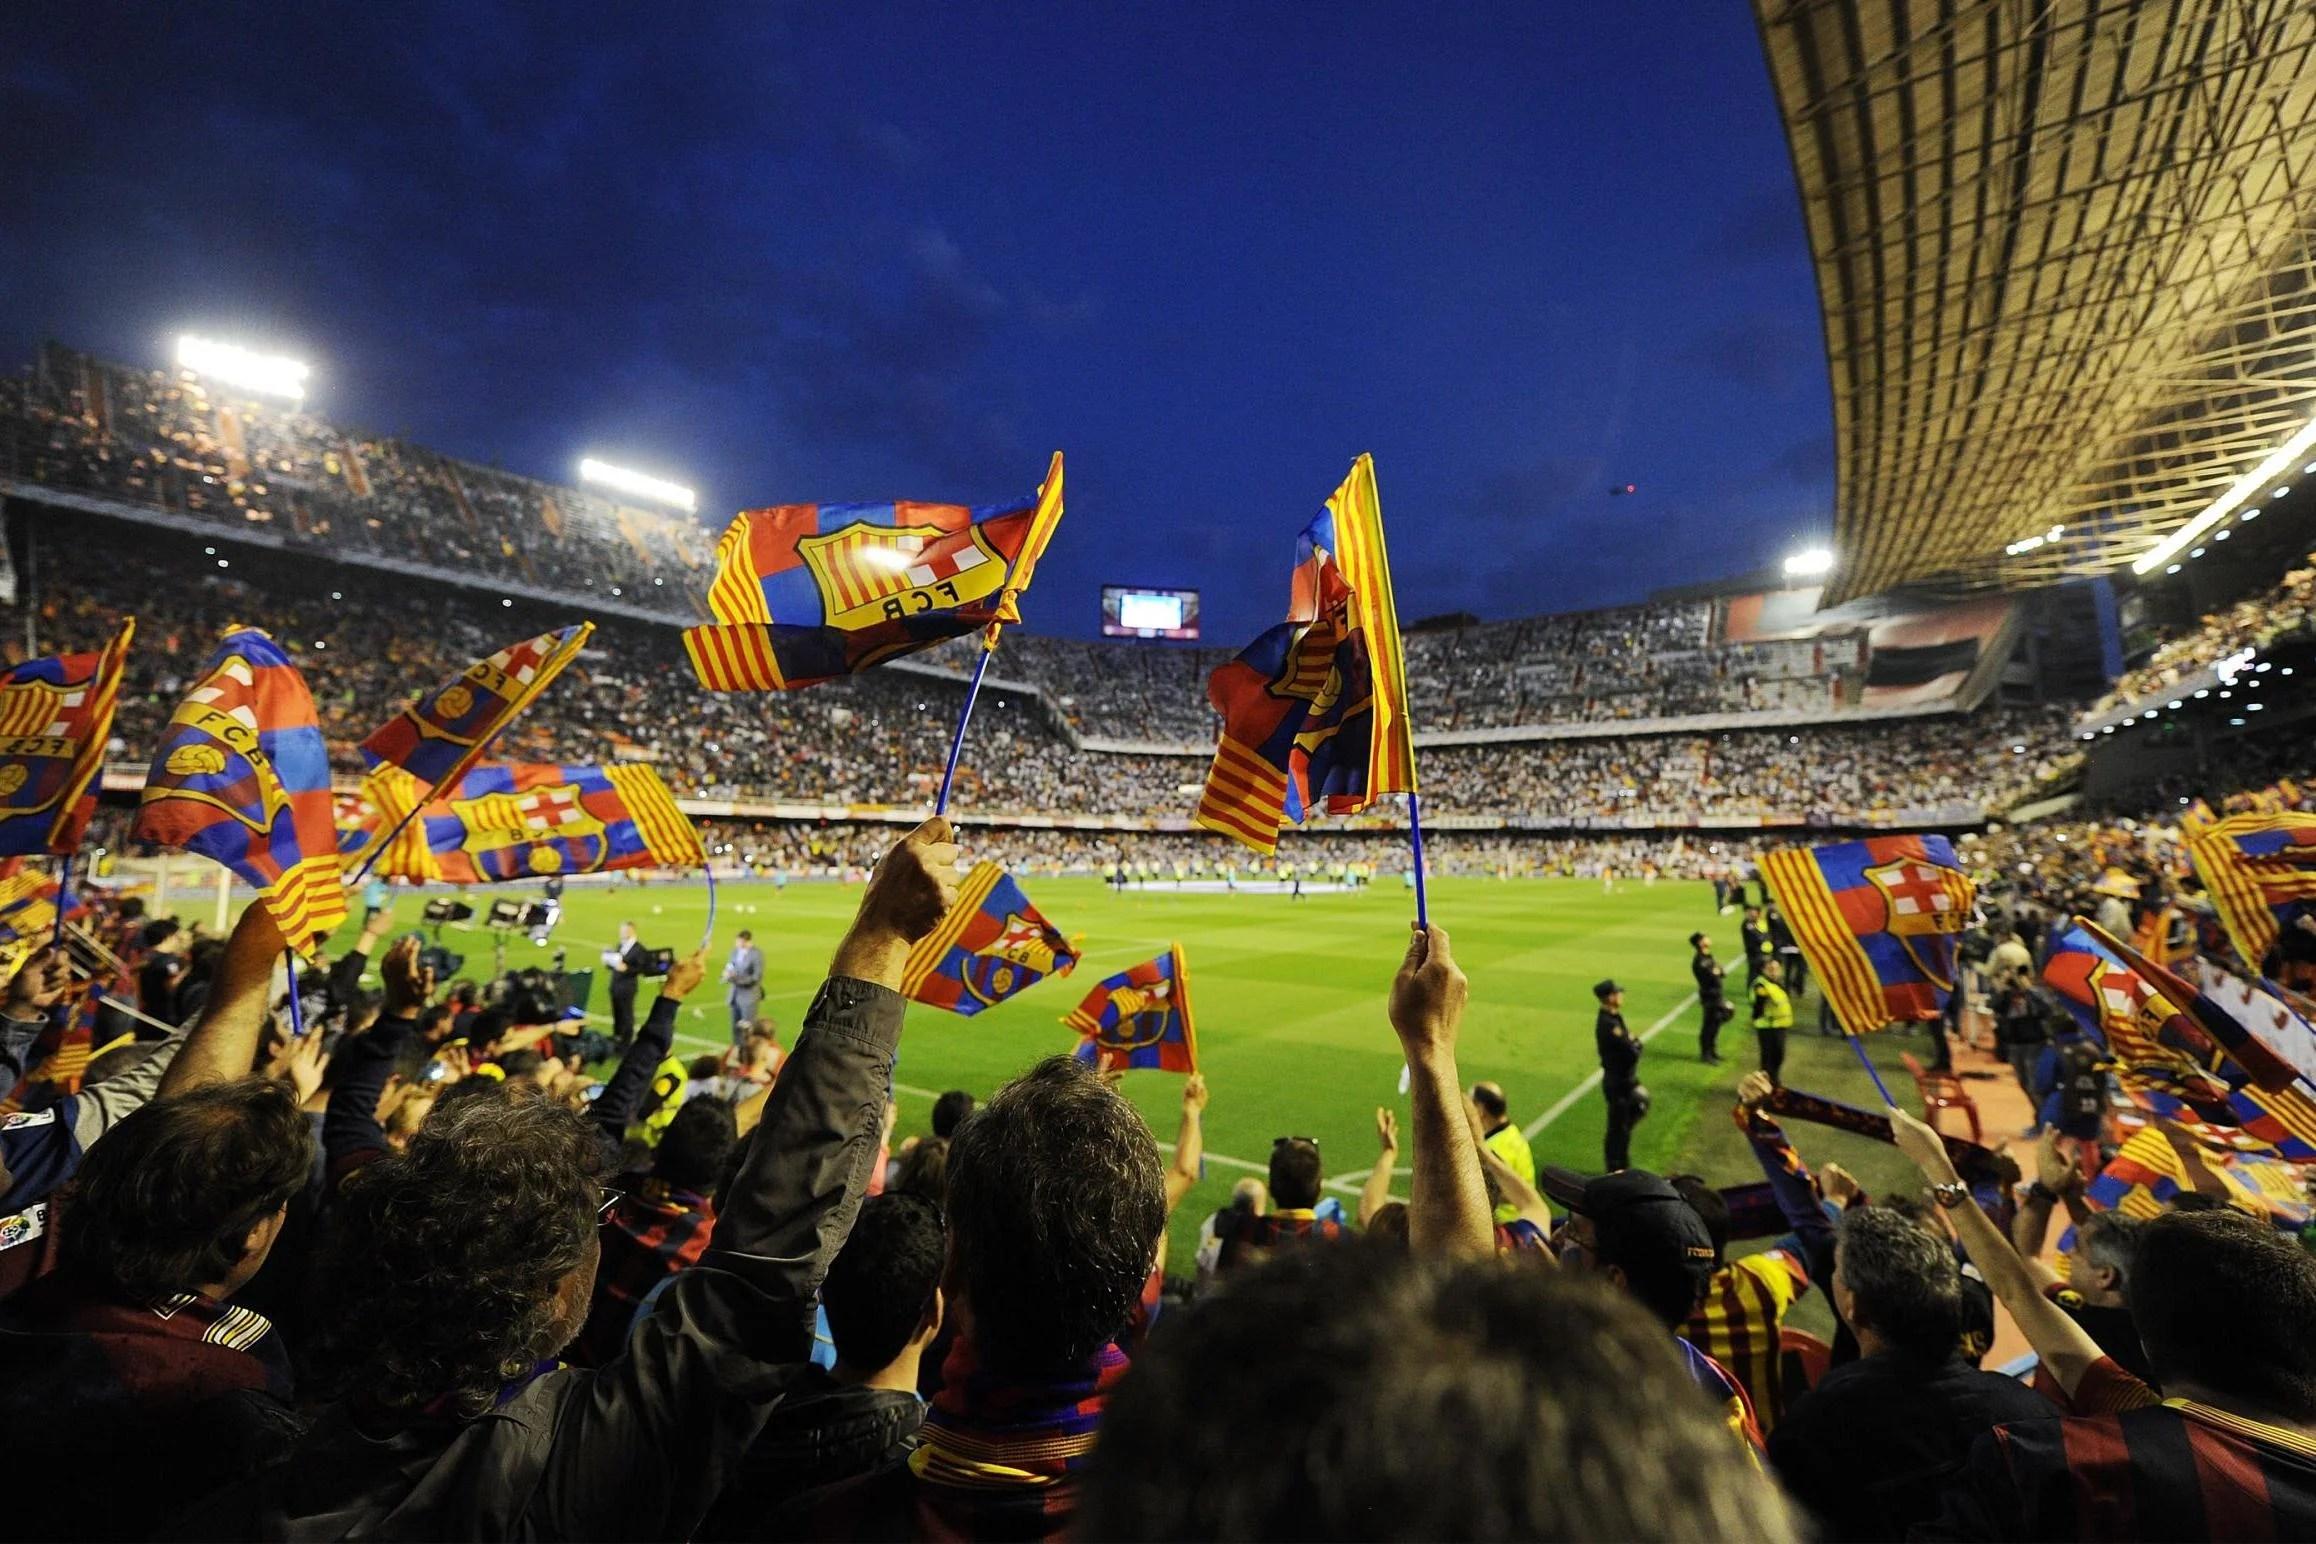 Arsenal Live Wallpaper Hd Barcelona Fixtures For La Liga 2018 19 Season Full